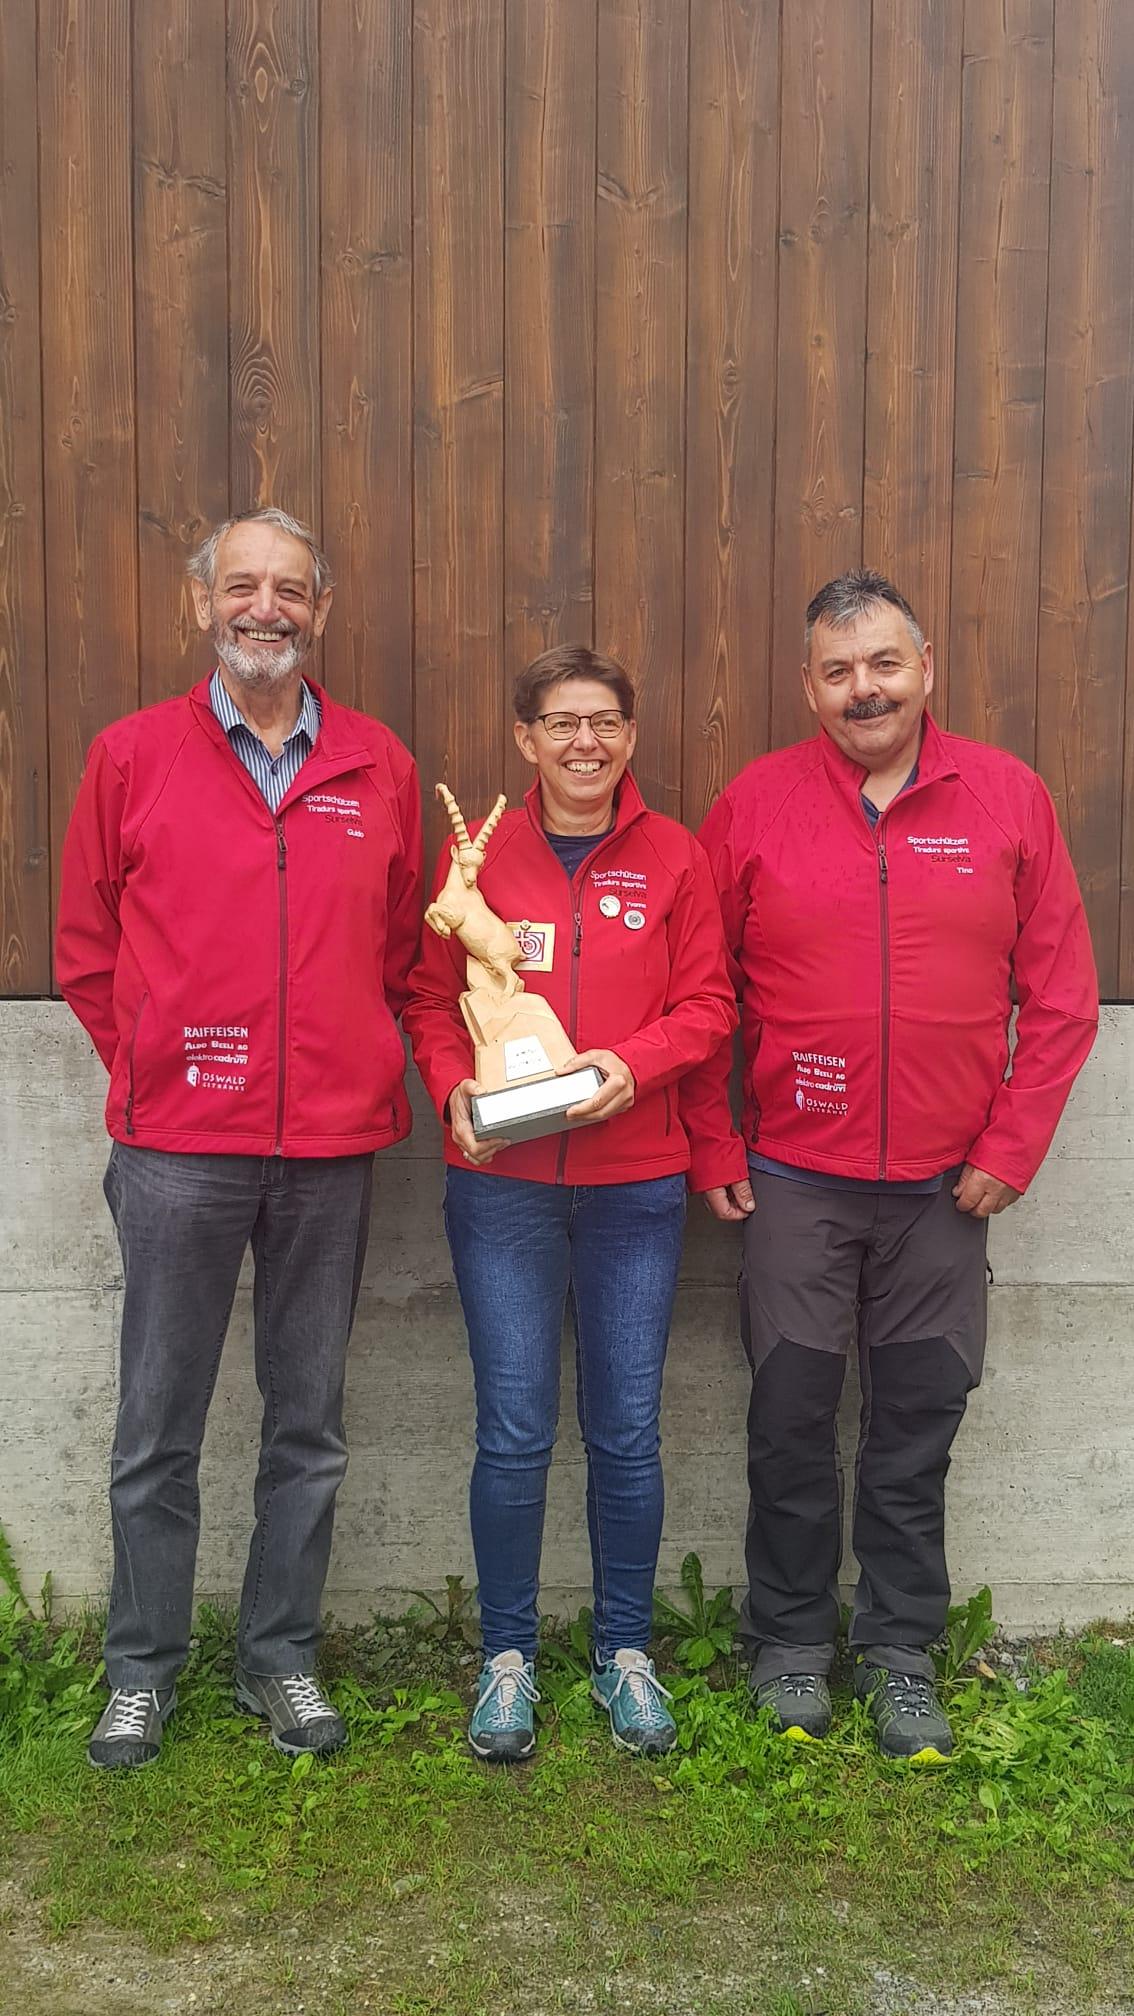 Bezirksmatchfinal 2020 in Pardiala Gruppensieger v.l. Guido * Yvonne * Alfons